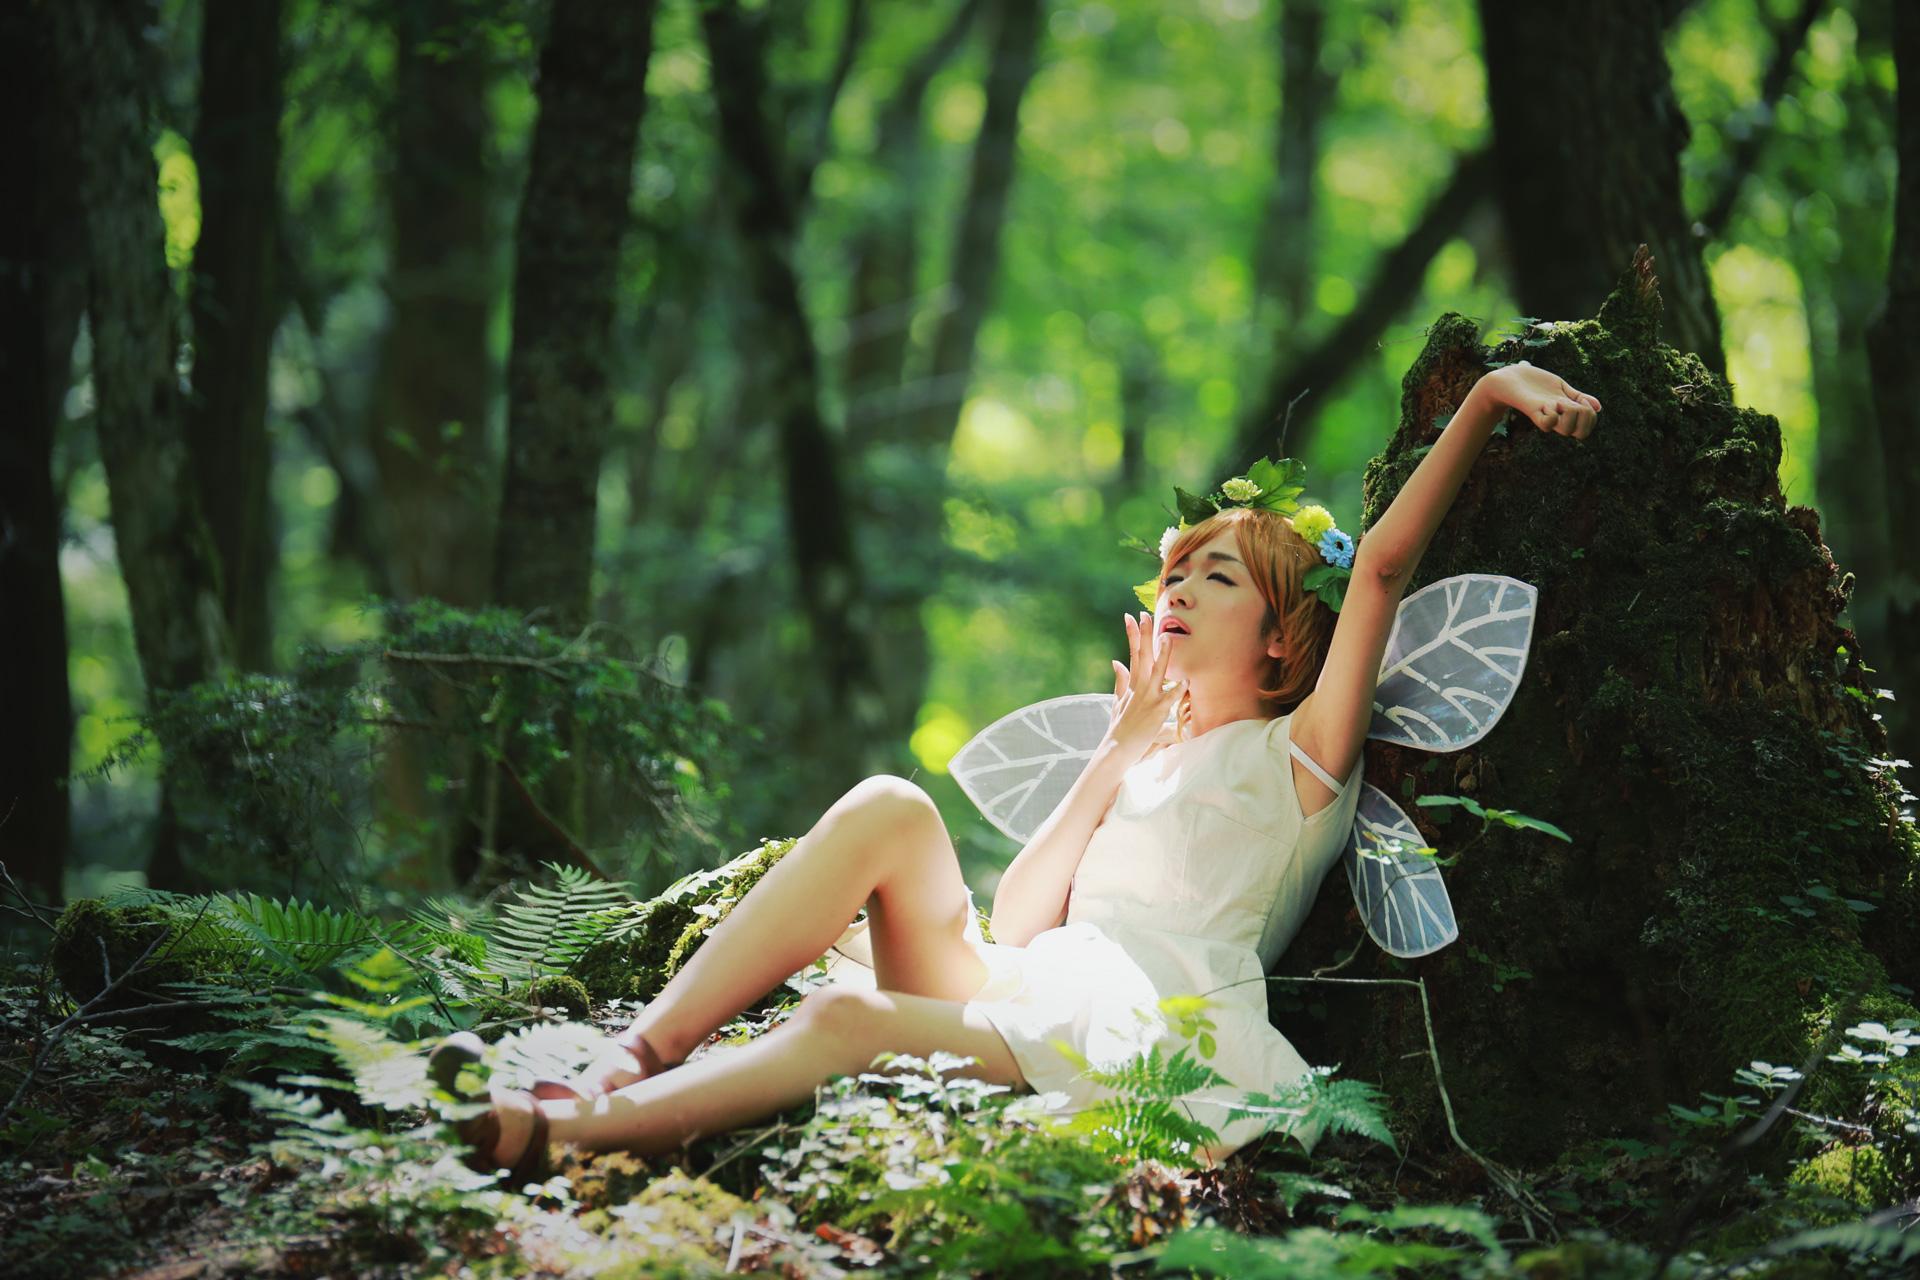 FAIRY TAIL ~ 幻想の森 モデル:ちゅーとさん